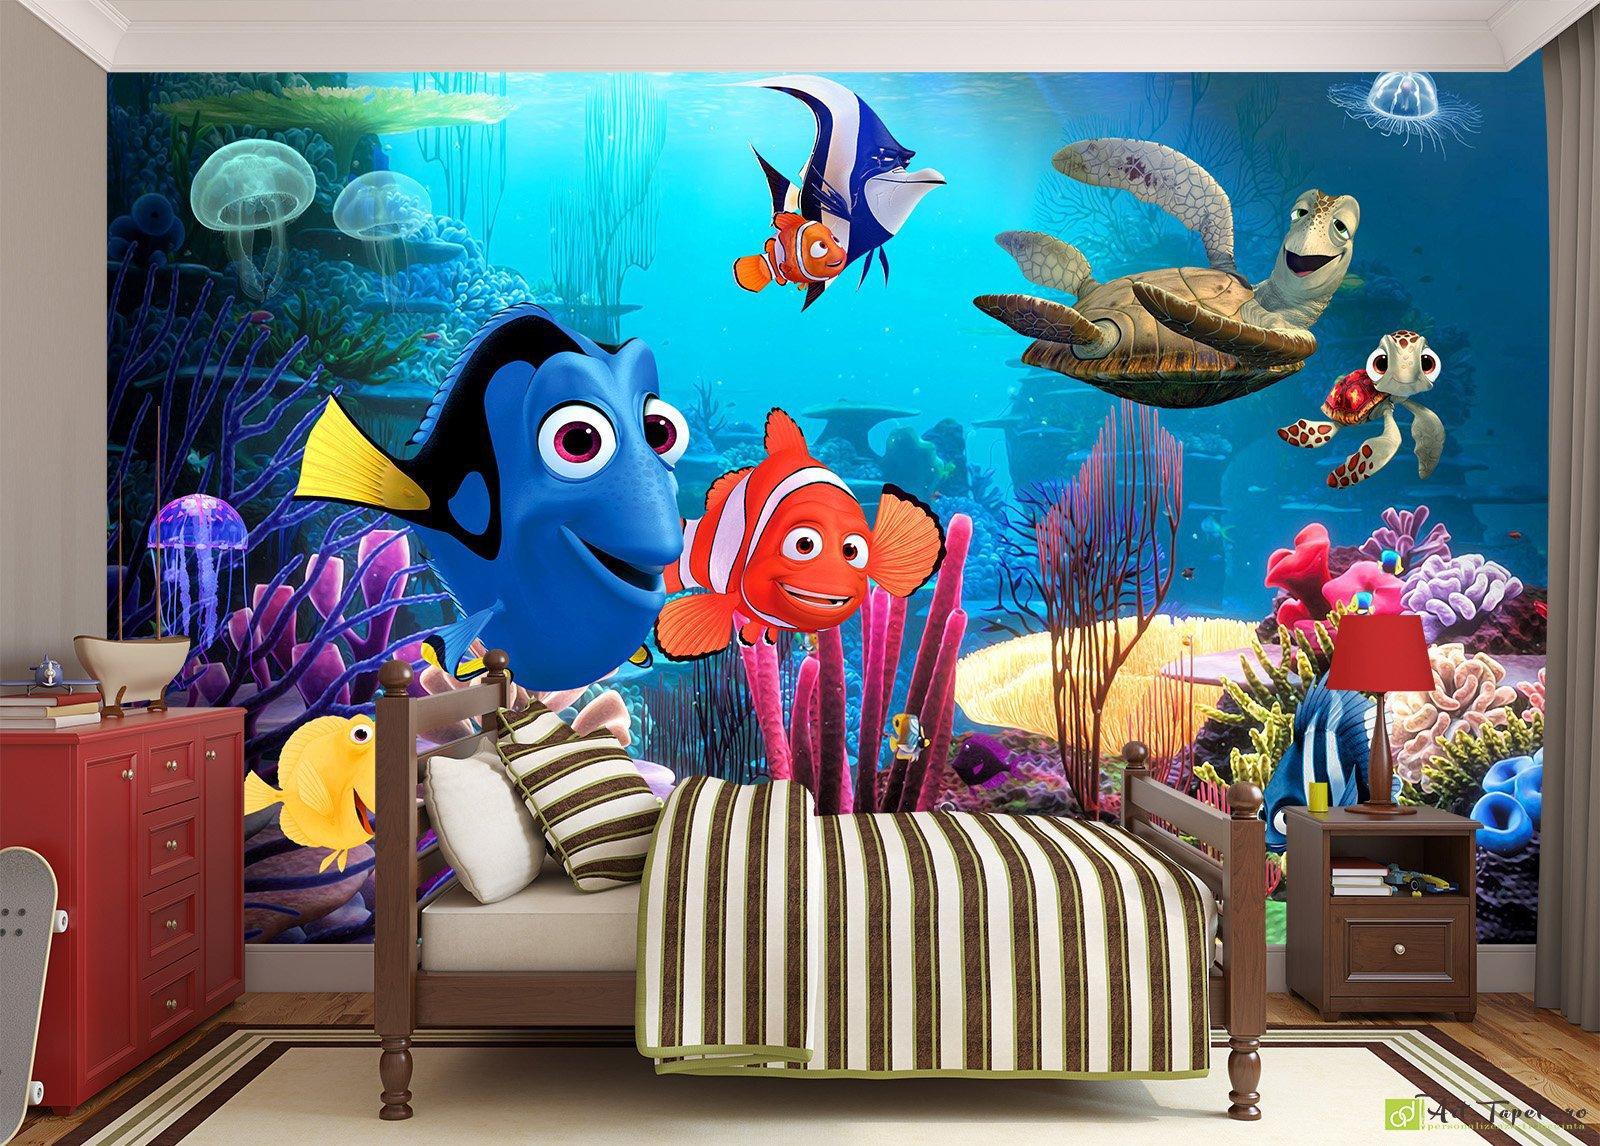 Children S Wallpaper Wall Murals Finding Nemo Fototapet Art Digital For All Tastes From Citieap Motifs To Designer Creations And